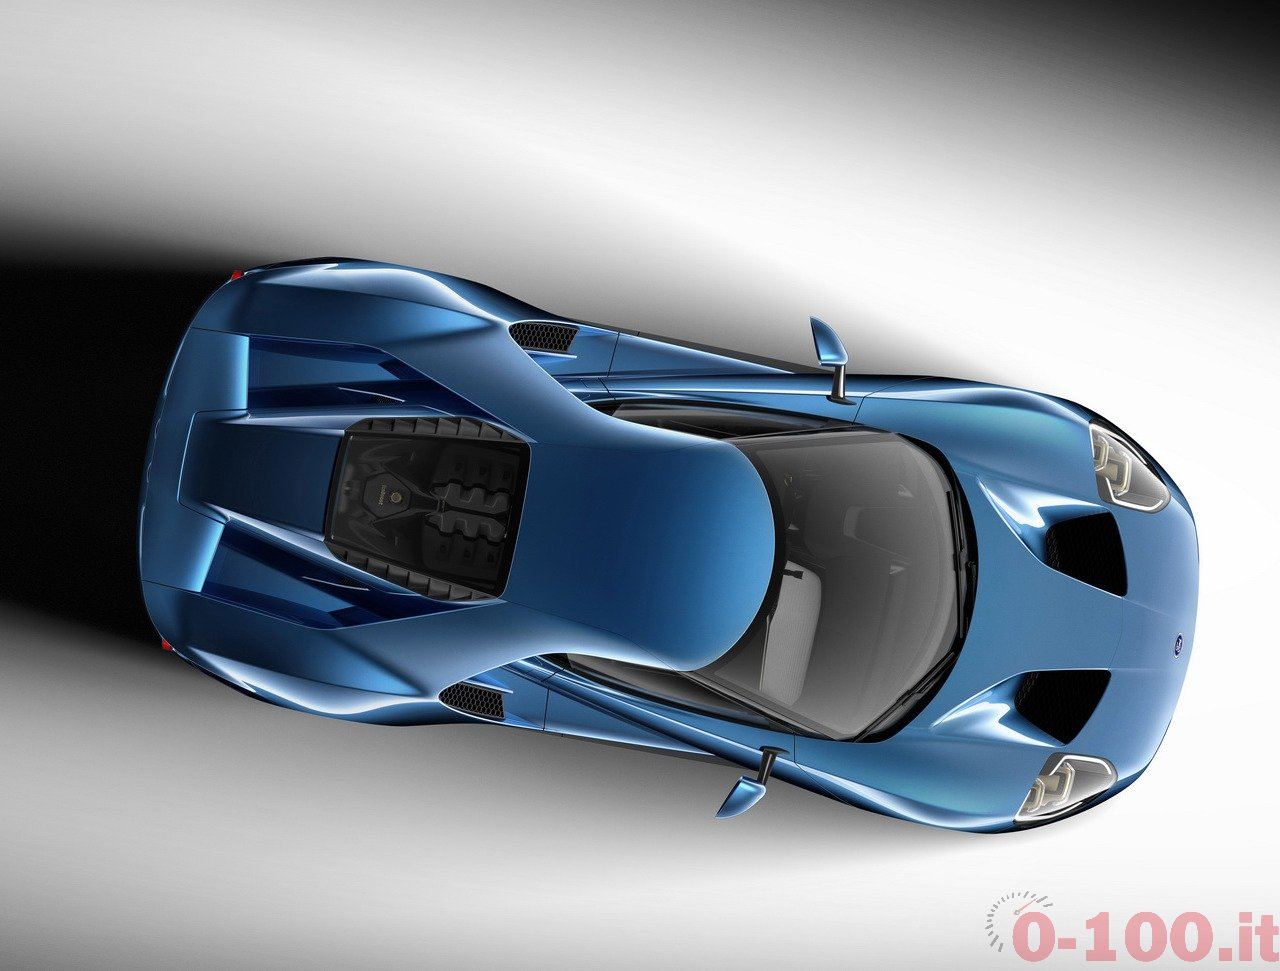 naias-salone-autoshow-detroit-2015-ford-gt-v6-ecoboost-prezzo-Price_0-100_7